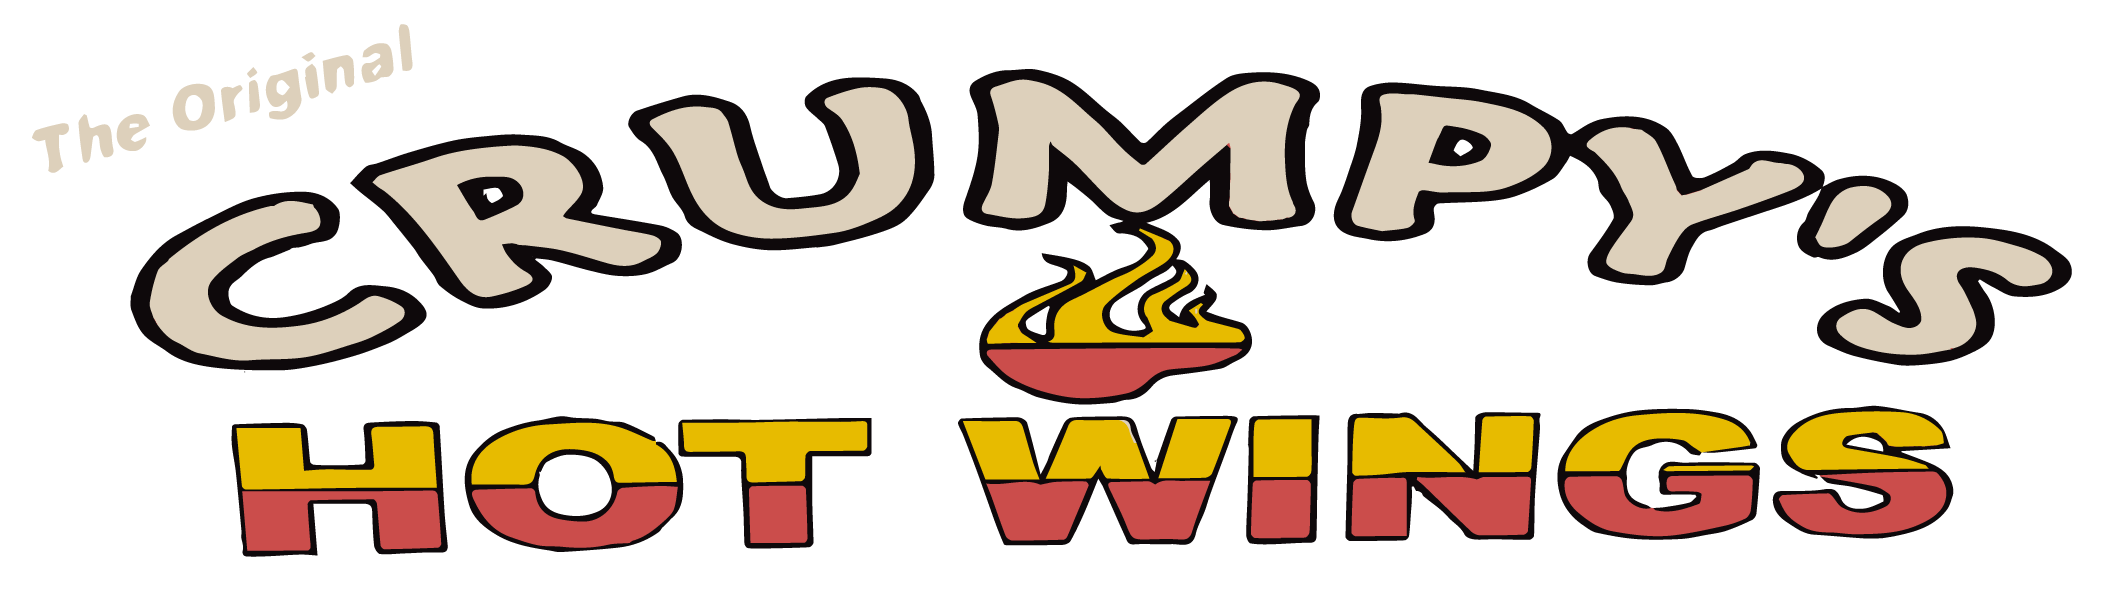 Crumpy's Old Logo